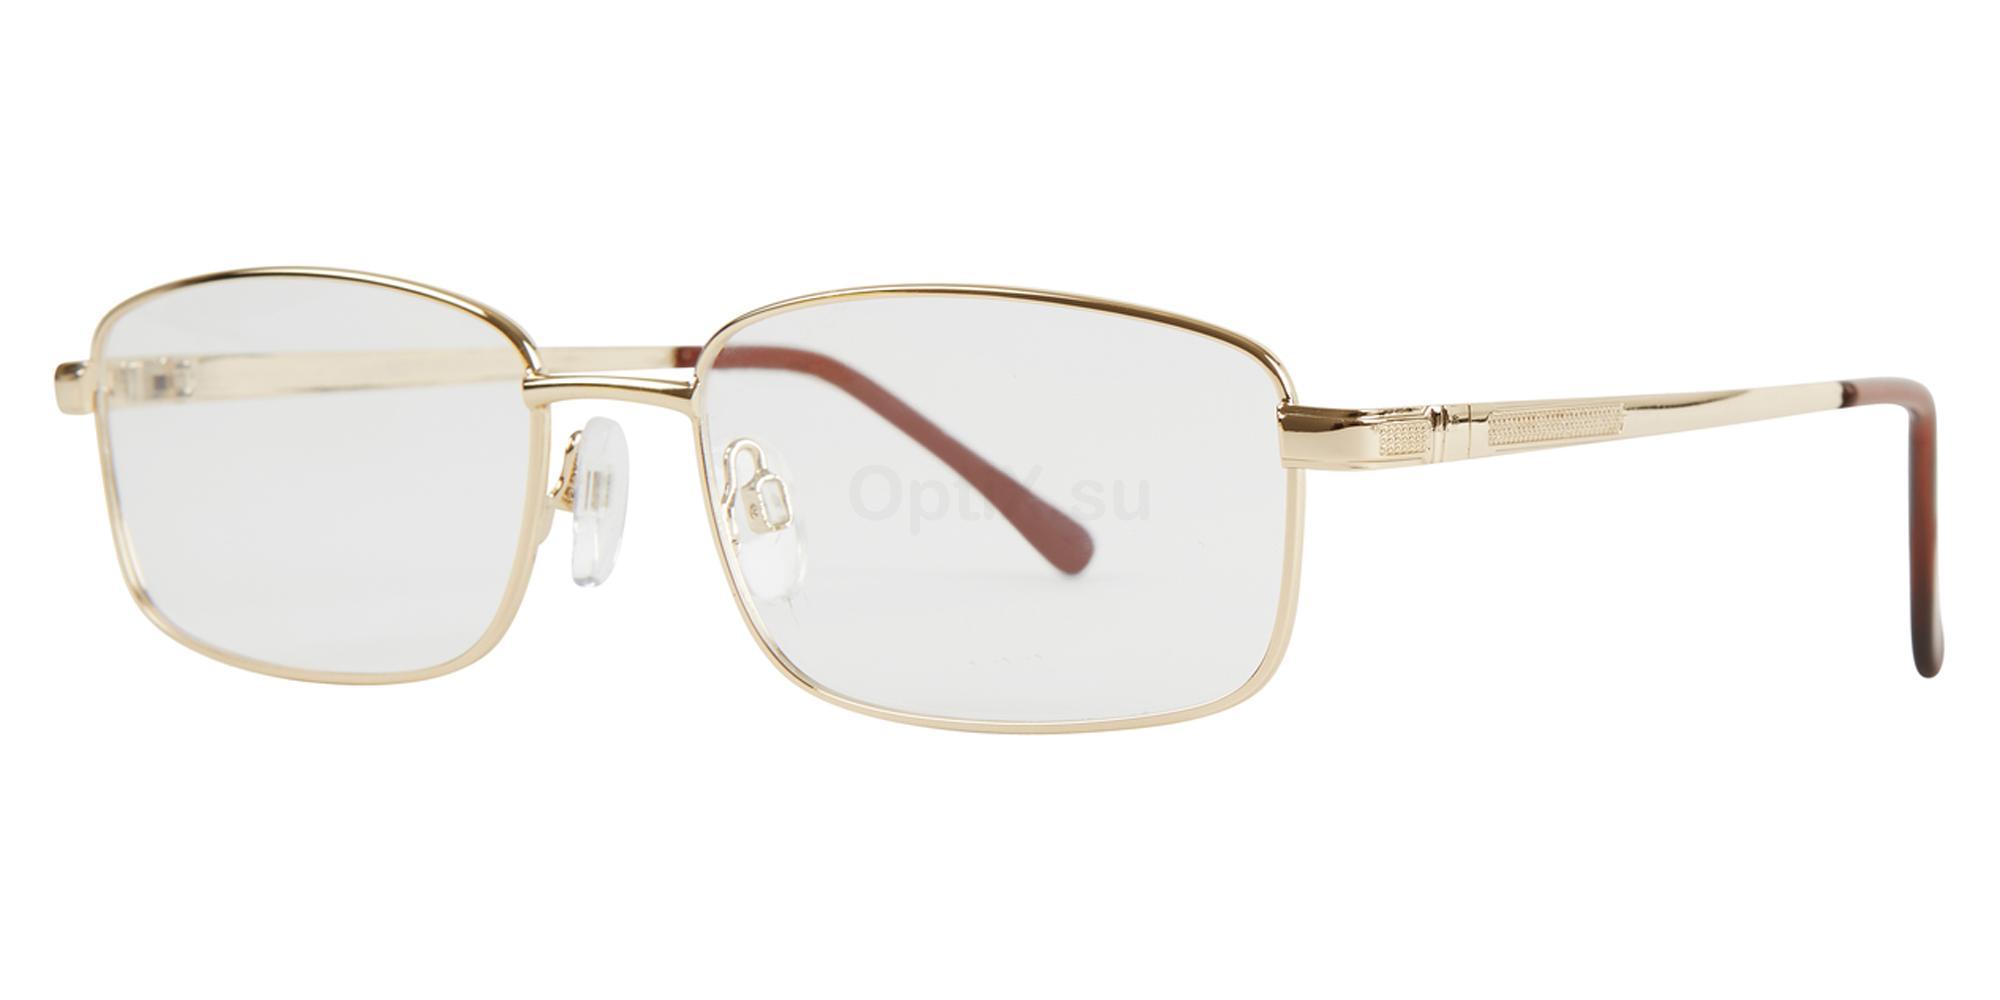 C1 Complete Mod 4 Glasses, Complete